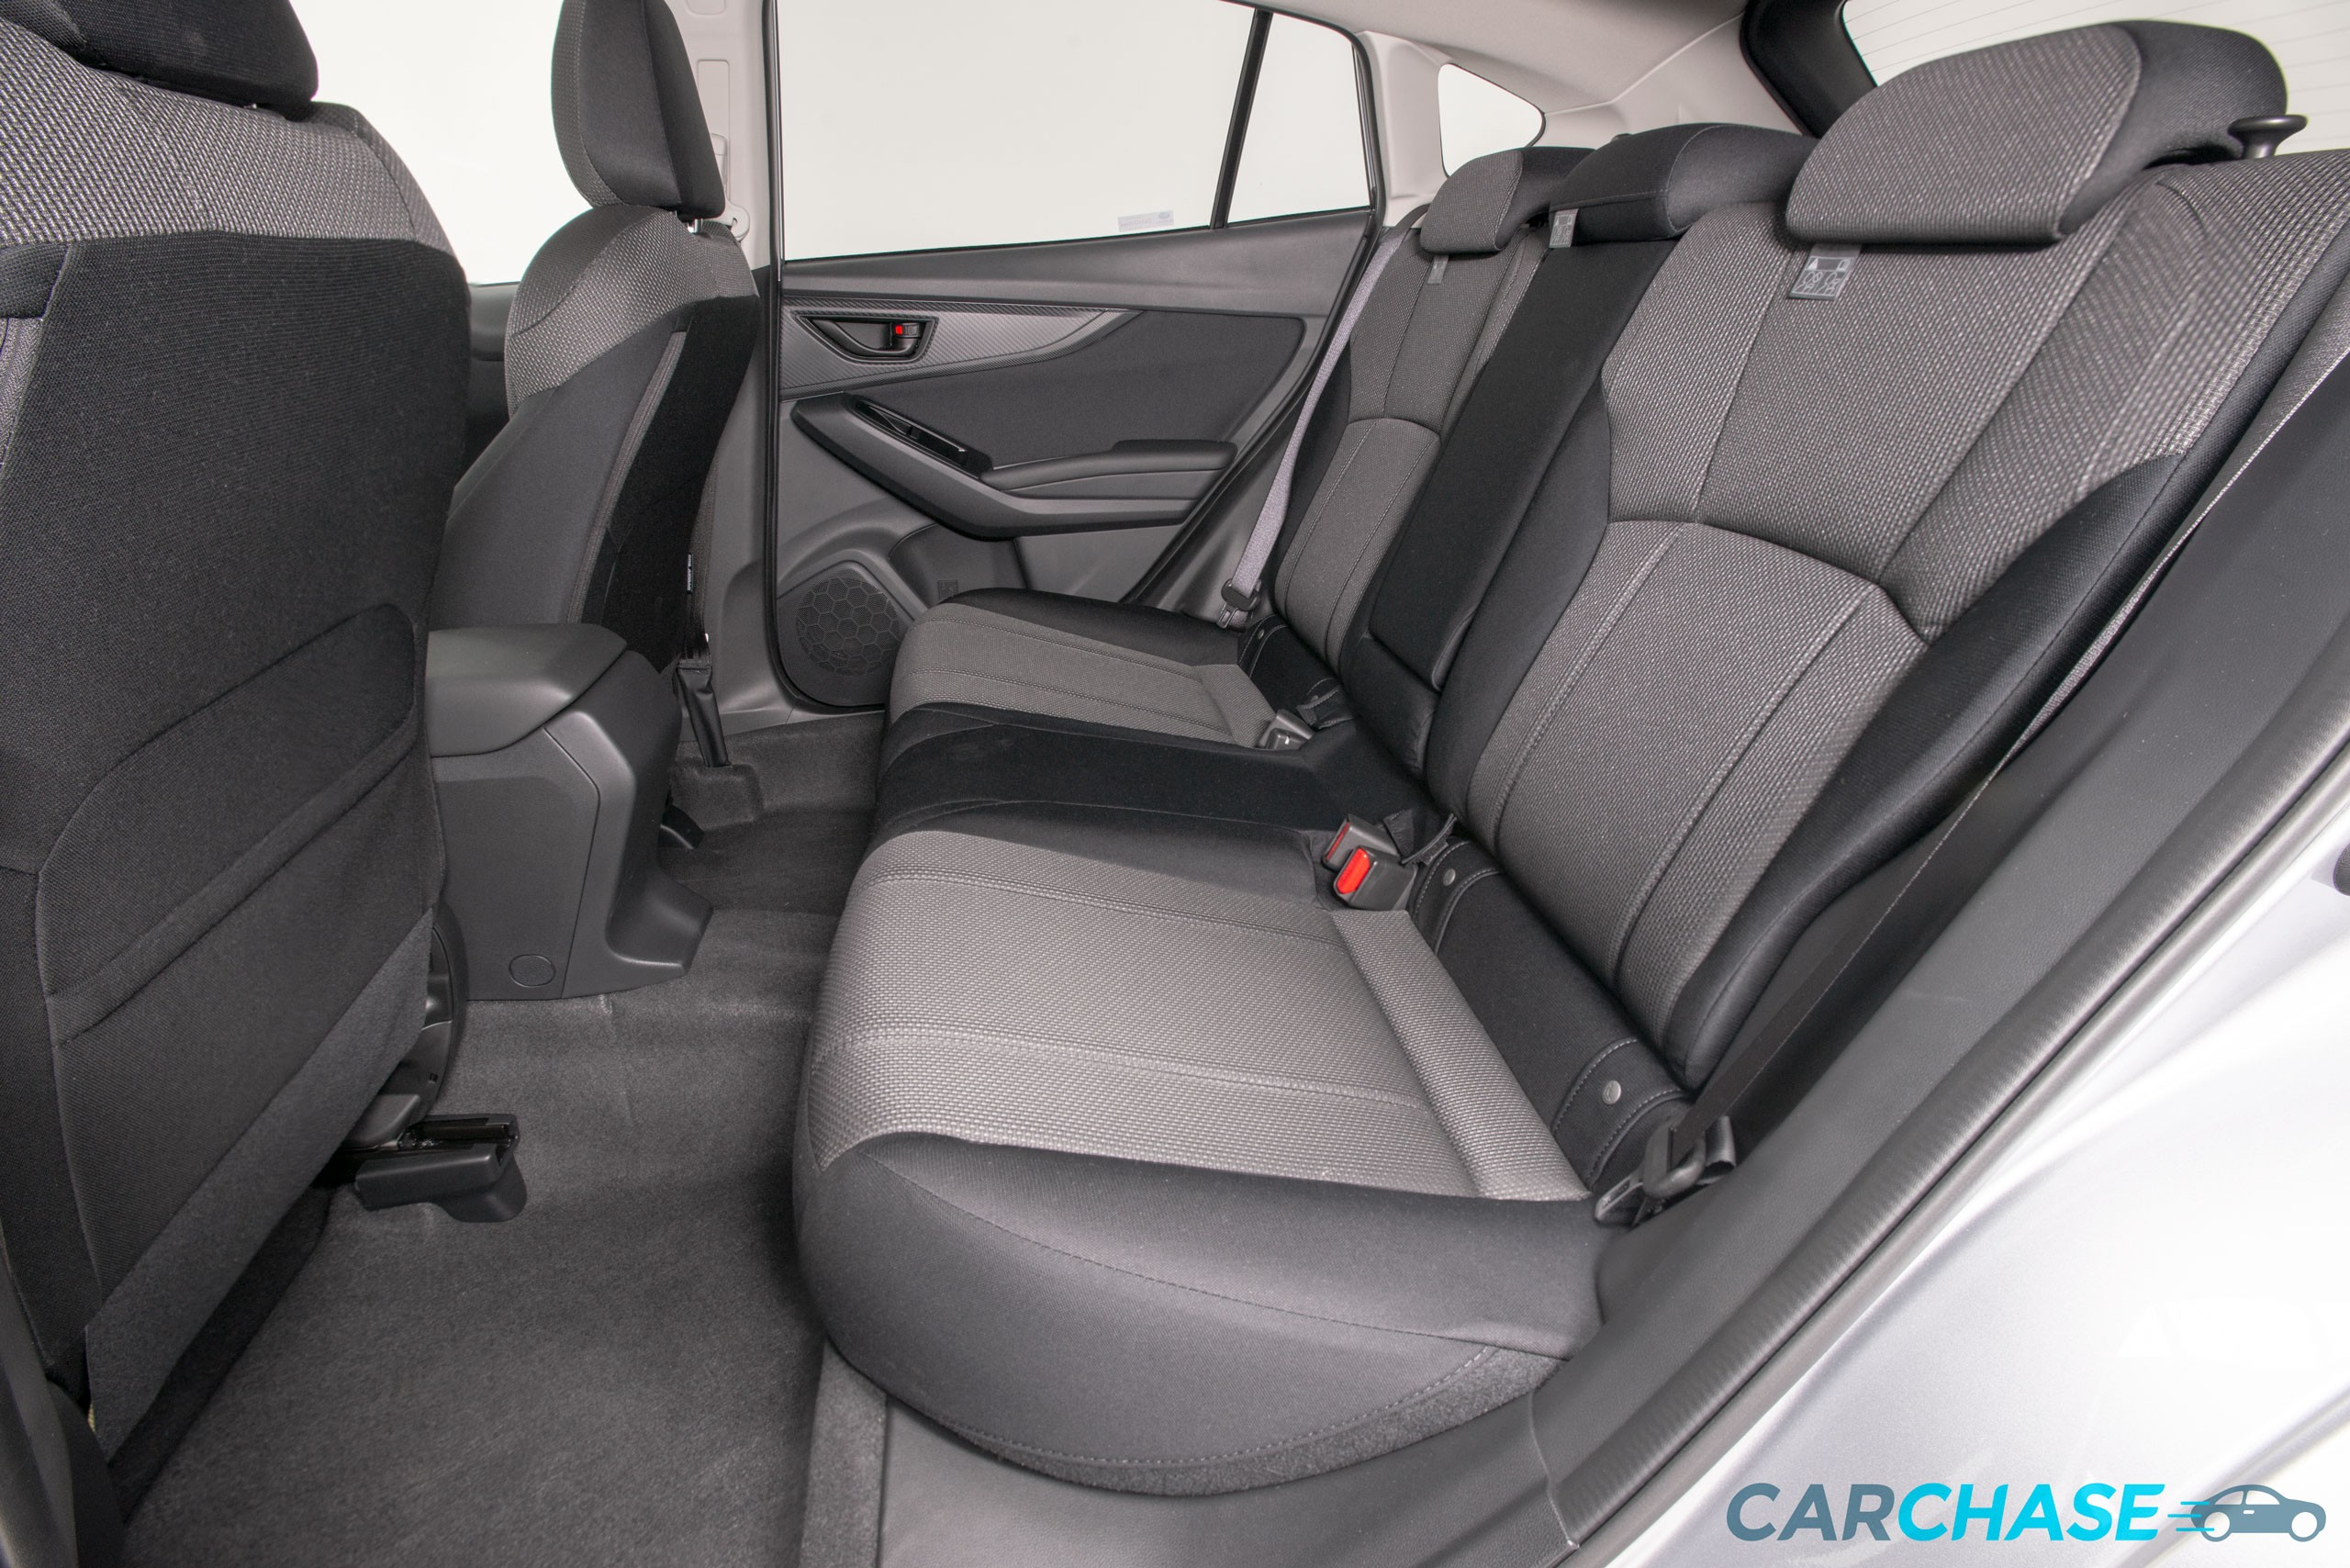 Image of passenger rear profile of 2018 Subaru Impreza 2.0i